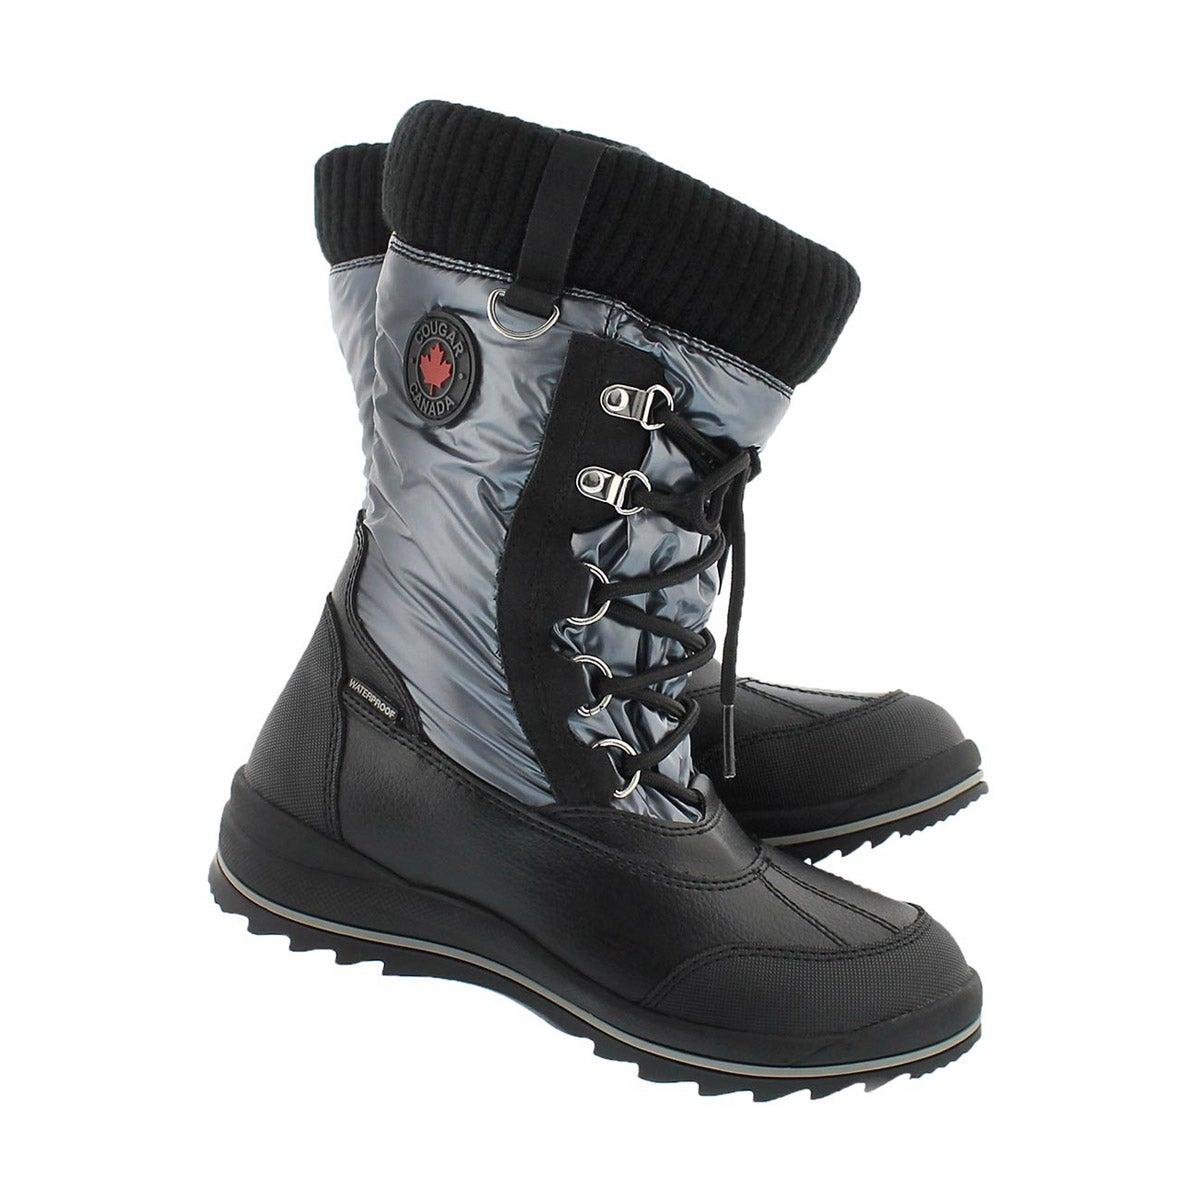 Grls Como grey wtpf pull on winter boot